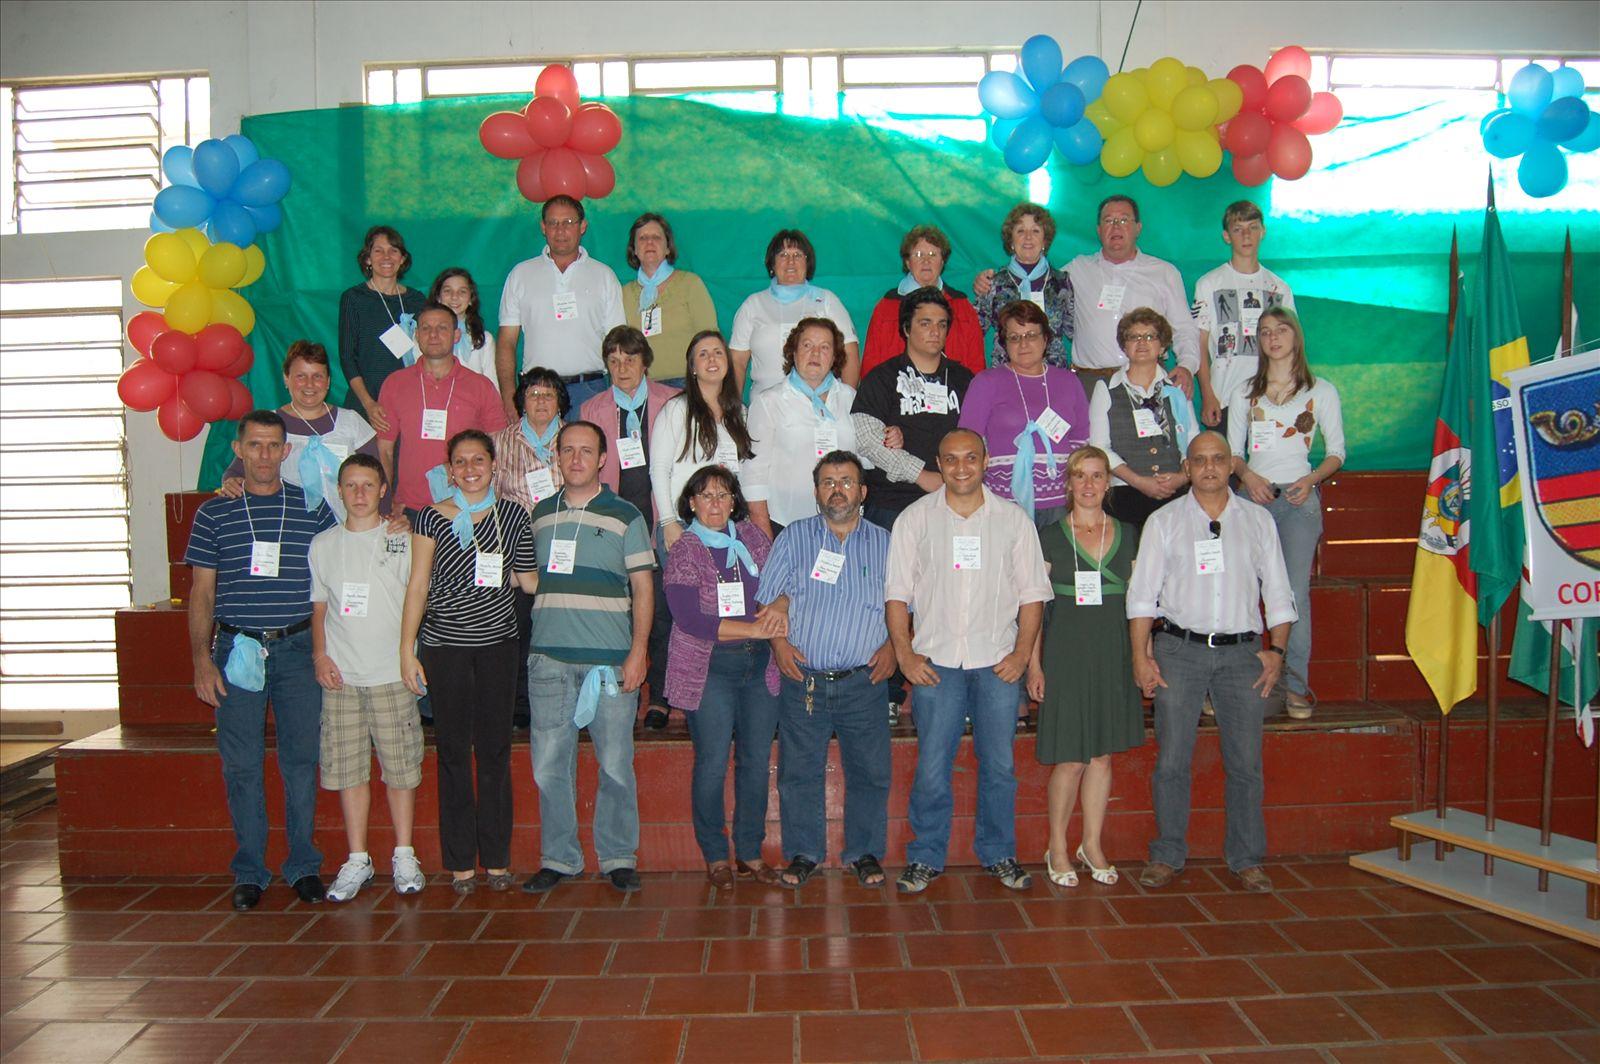 2º Encontro Família Cornelli - 11.10.2009 (188)_0